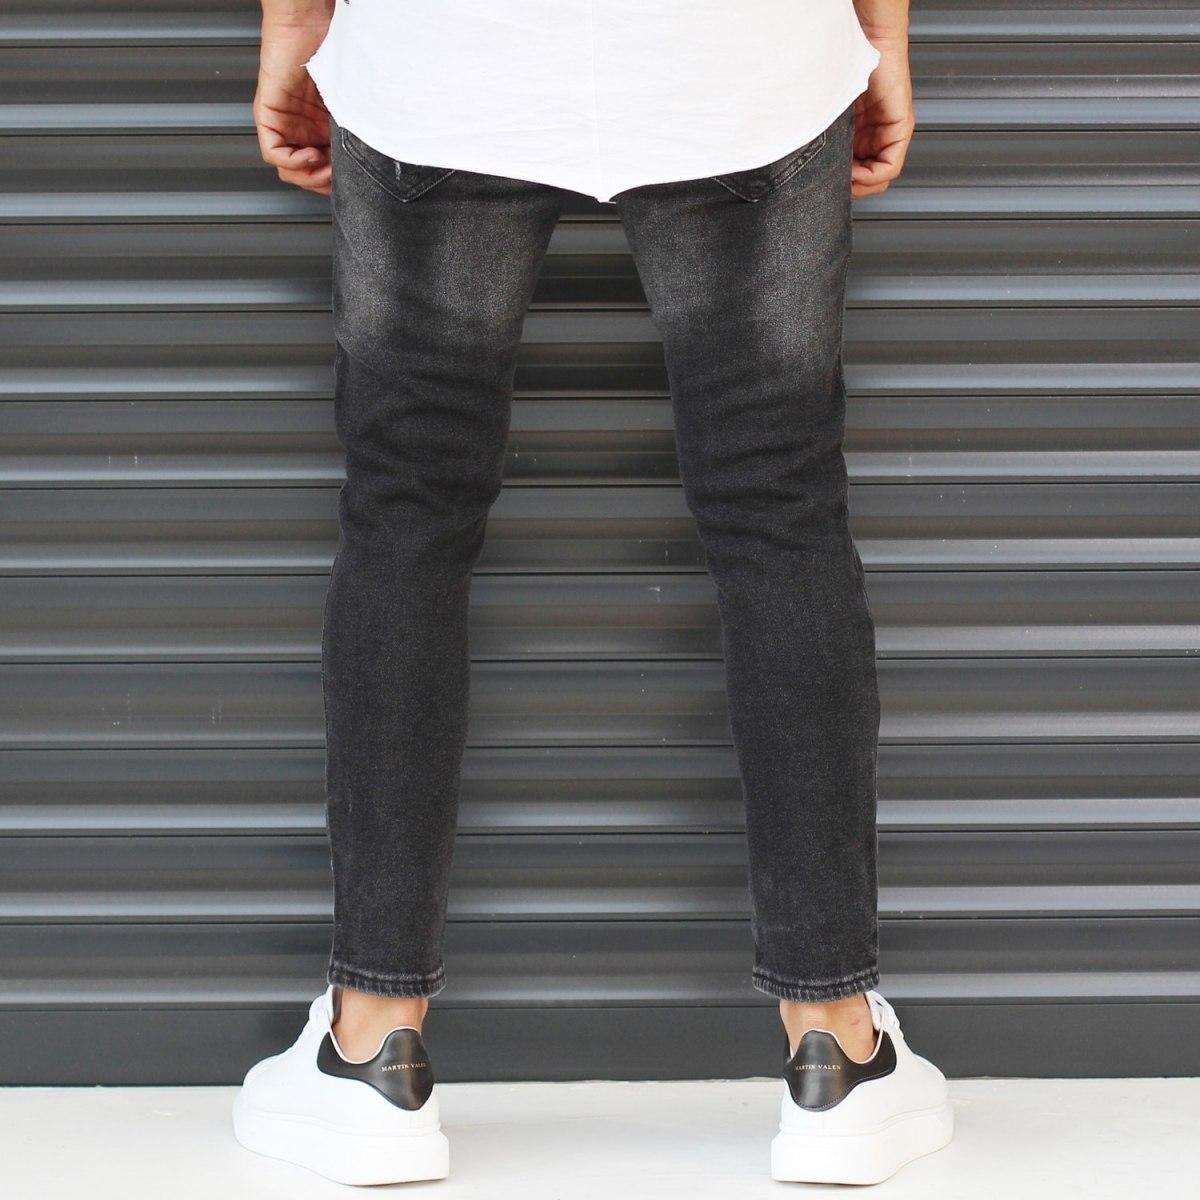 Men's Basic Stonewashed Jeans In Black Mv Premium Brand - 4